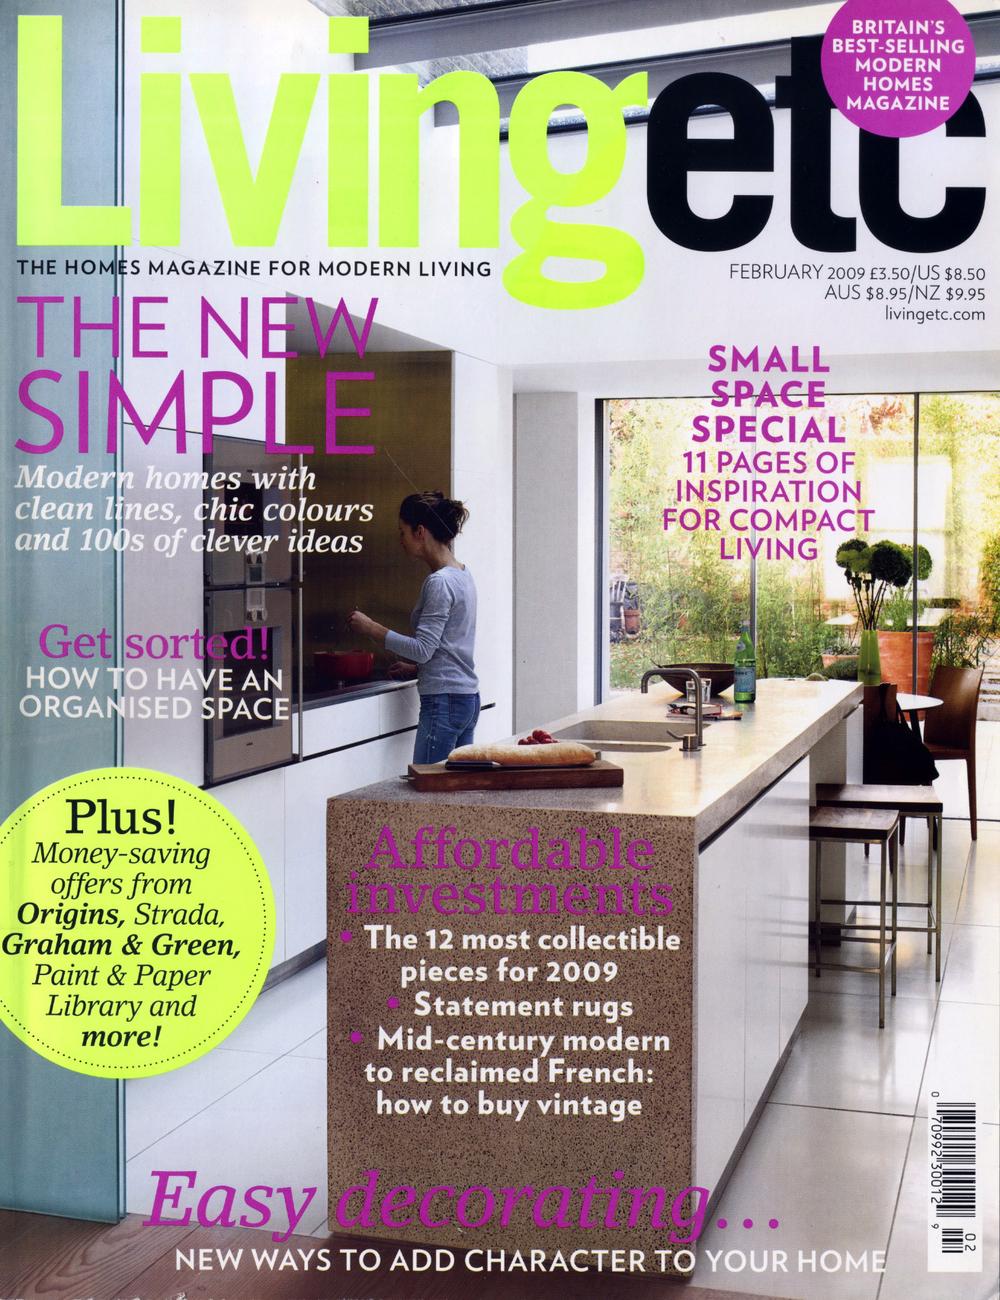 © ghislaine viñas interior design-living ect.02.09.jpg